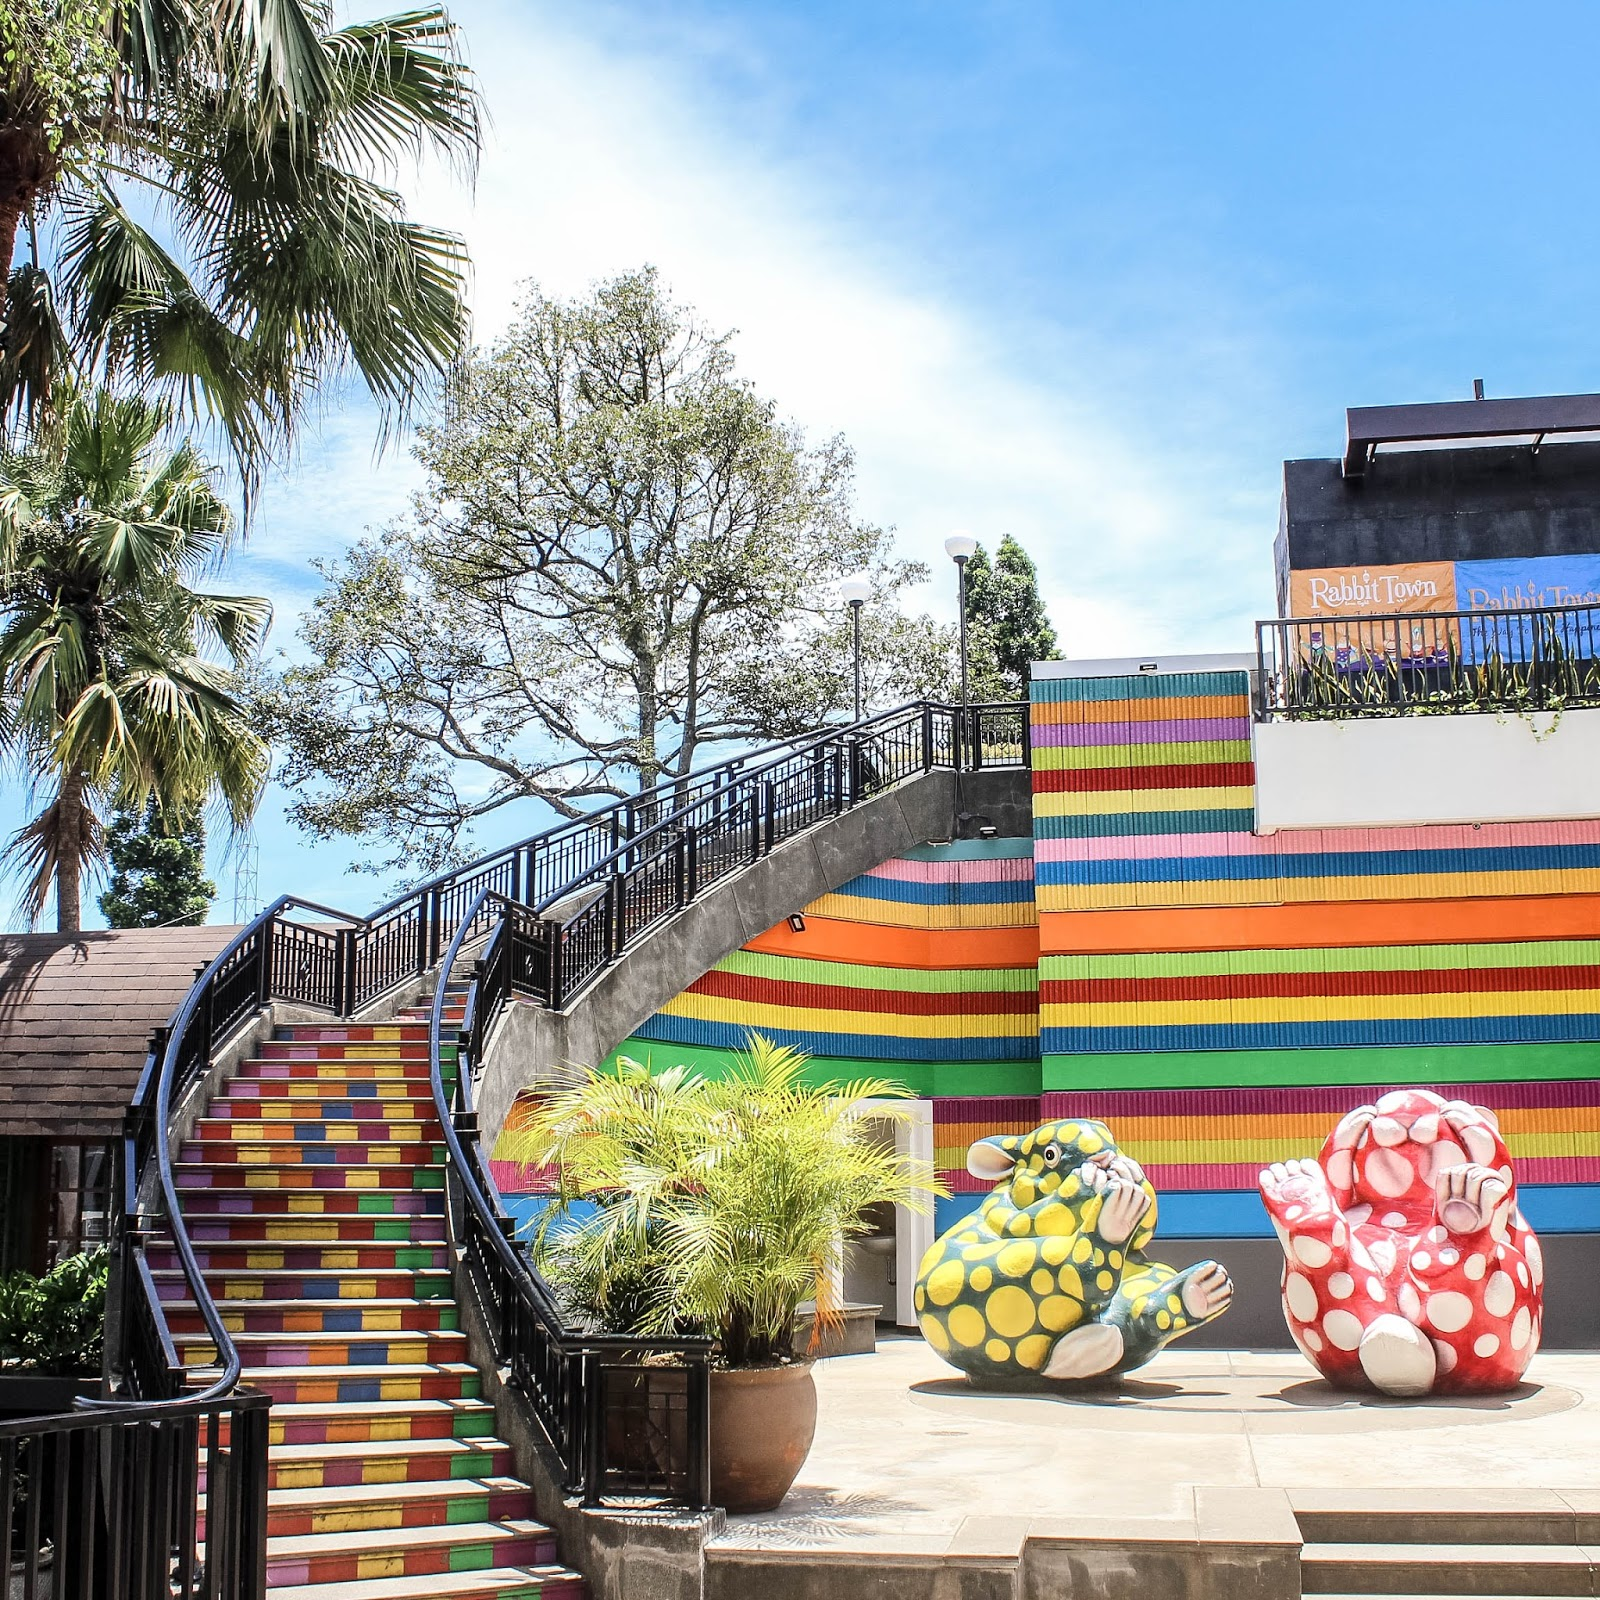 Tempat Wisata Bandung Terbaru Yang Wajib Dikunjungi Blog